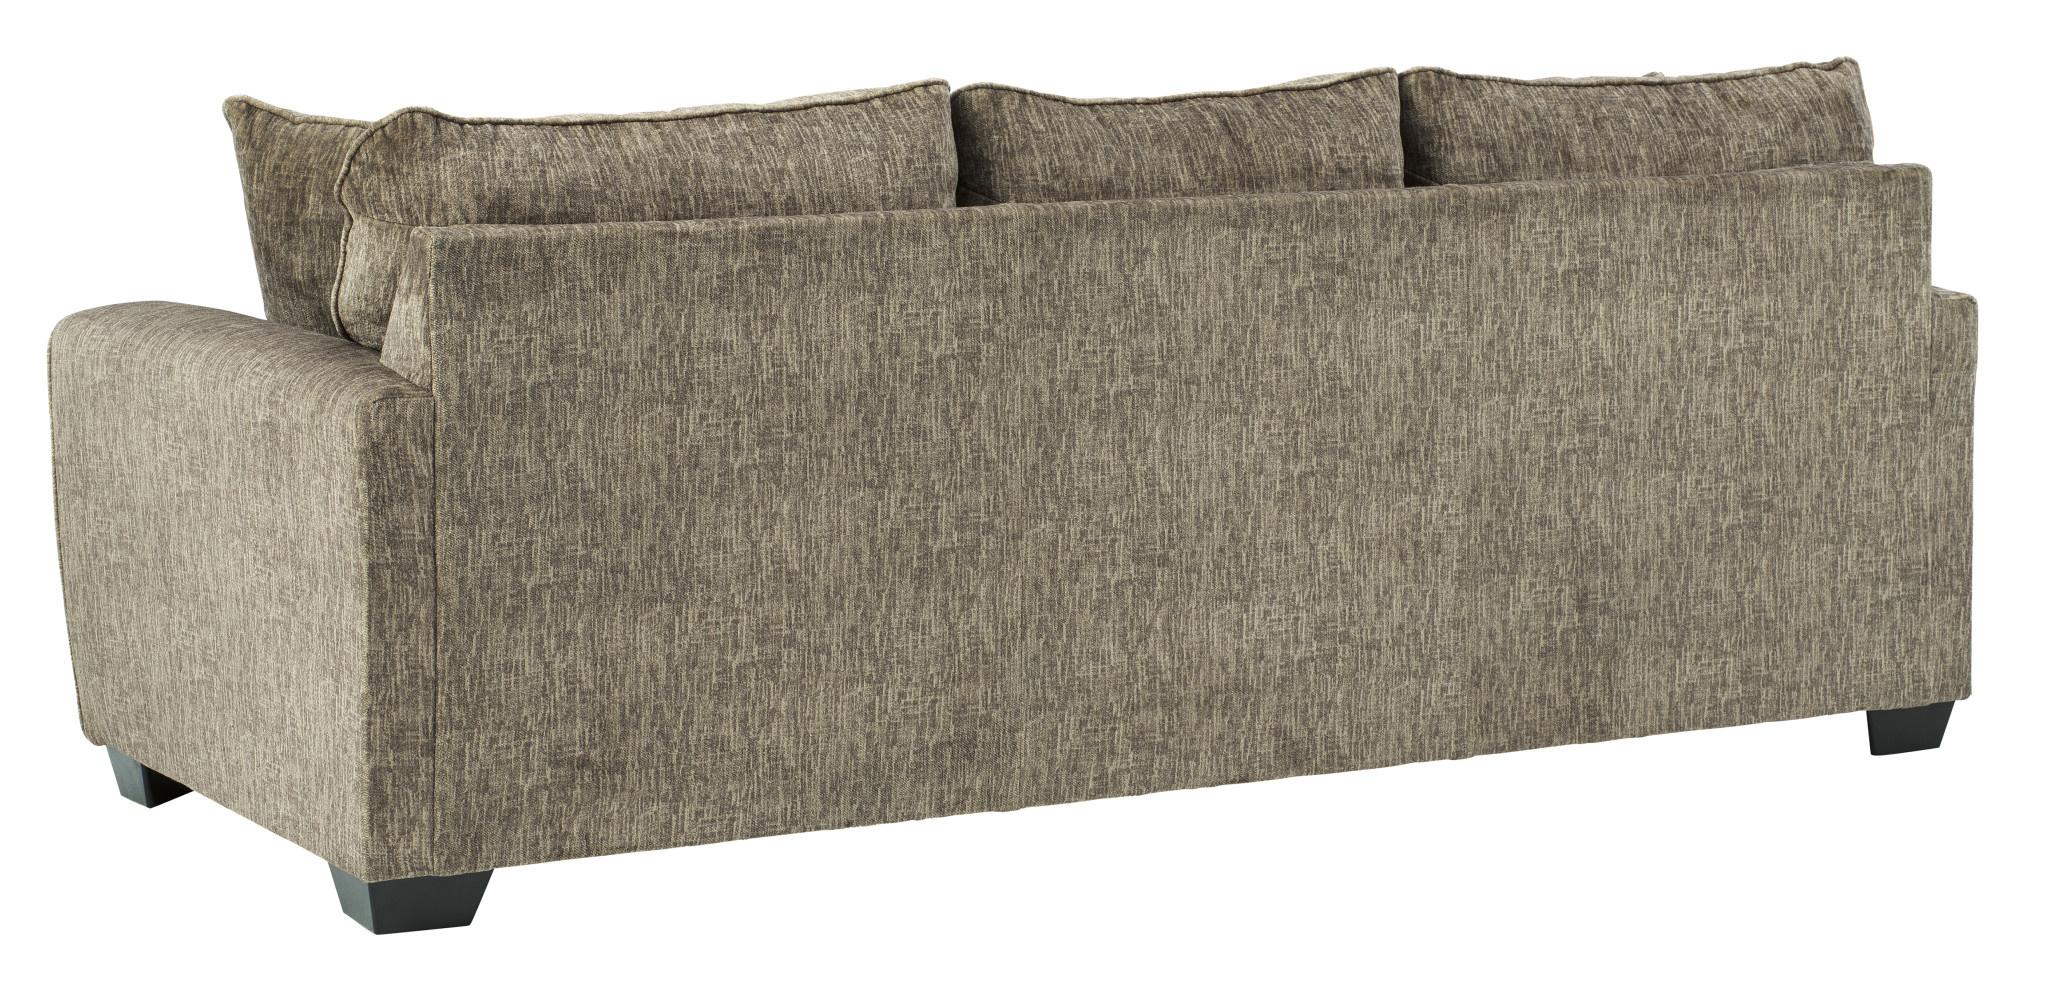 "Signature Design ""Olin"" Sofa- Chocolate- 4000238"